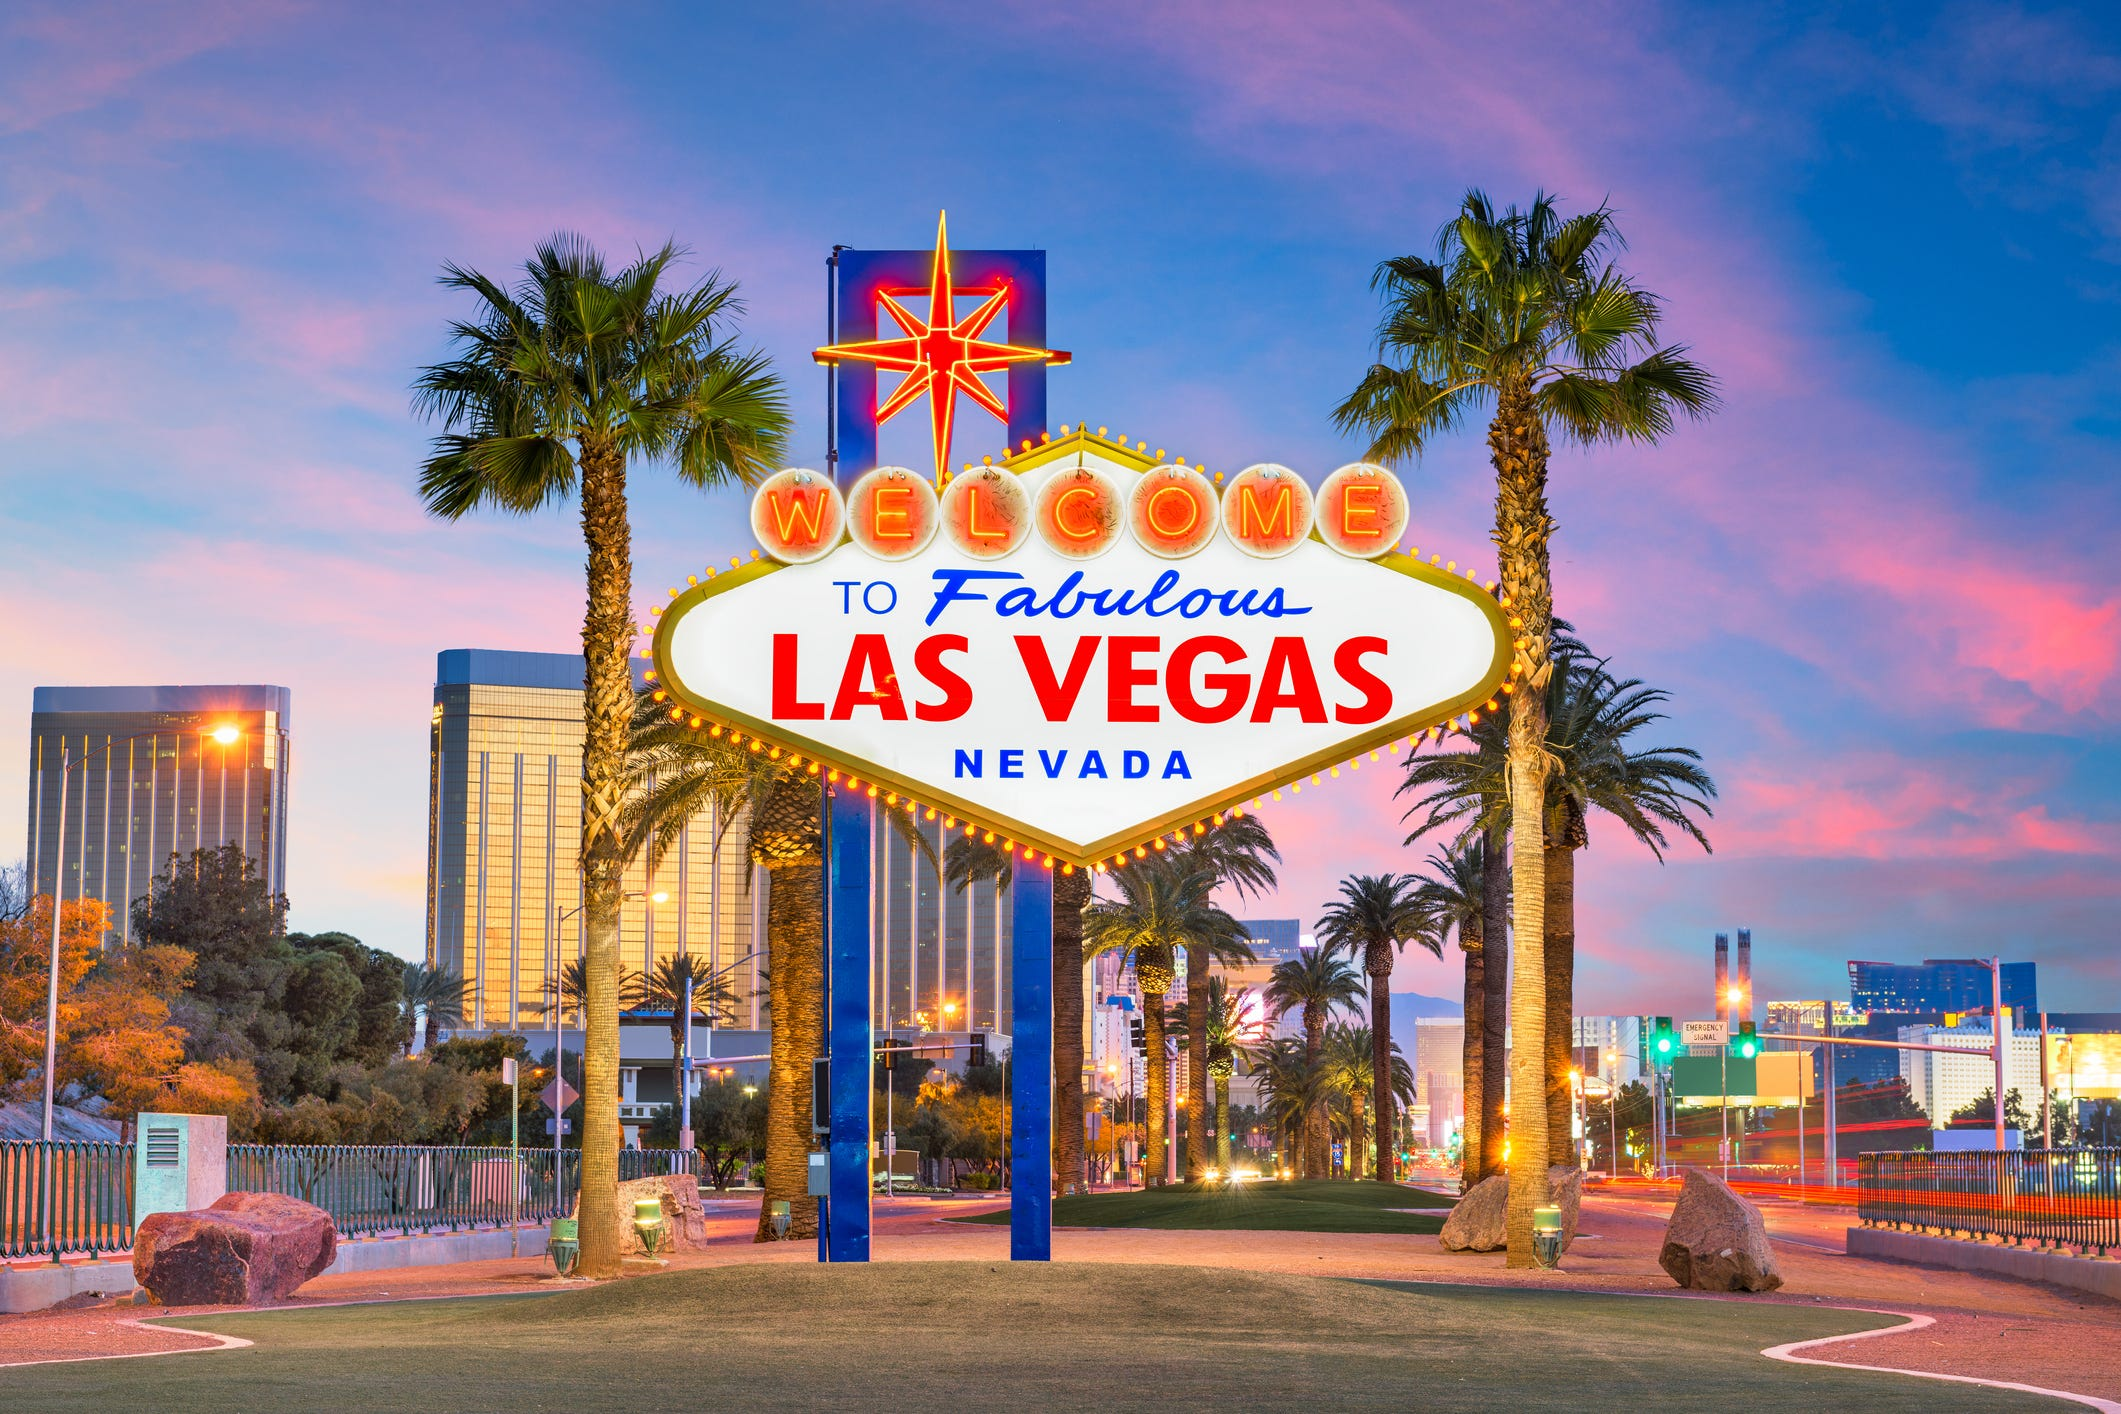 Leaving Las Vegas $300,000 richer: Tourist hits jackpot at airport slot machine